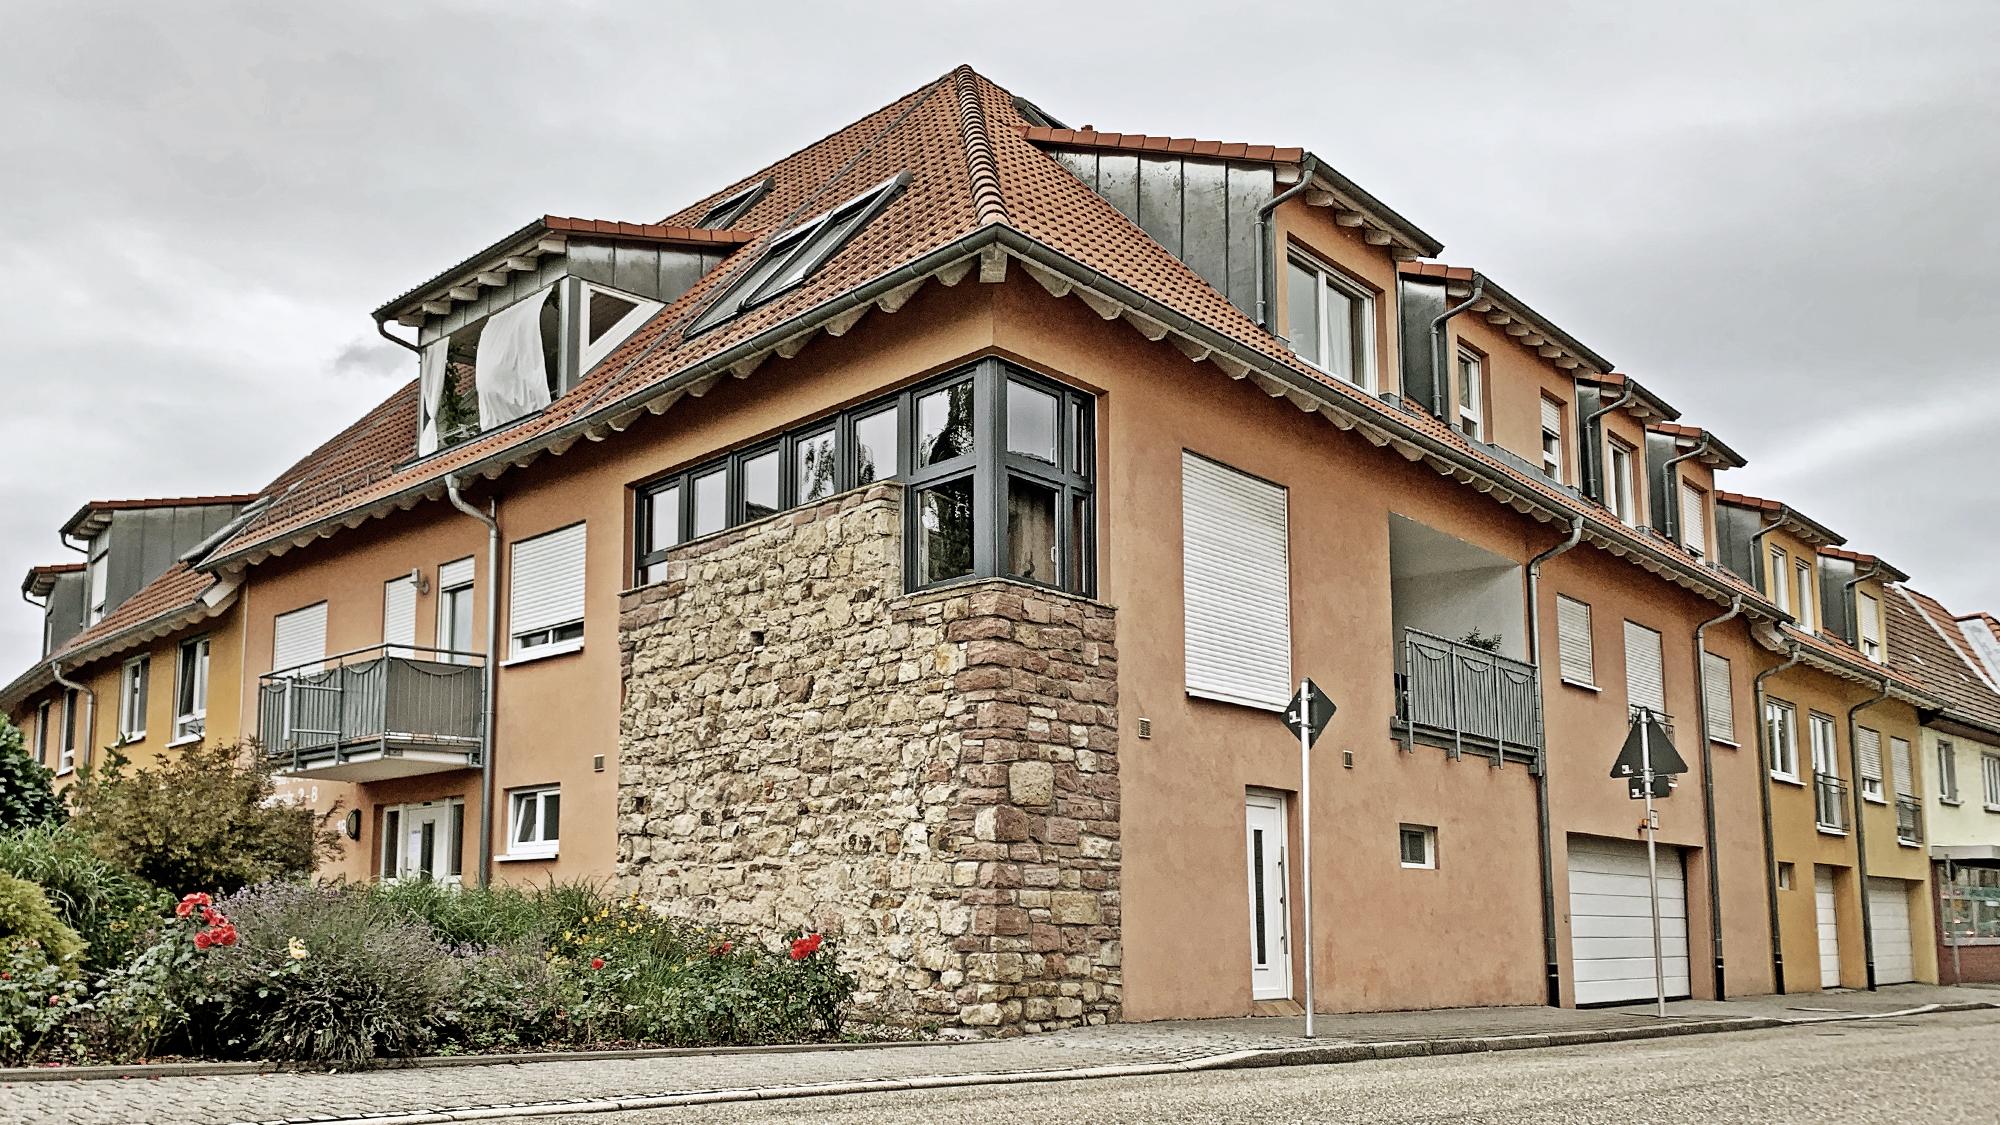 Bauprojekt Kuppenheim - Westermann Bau GmbH Kuppenheim